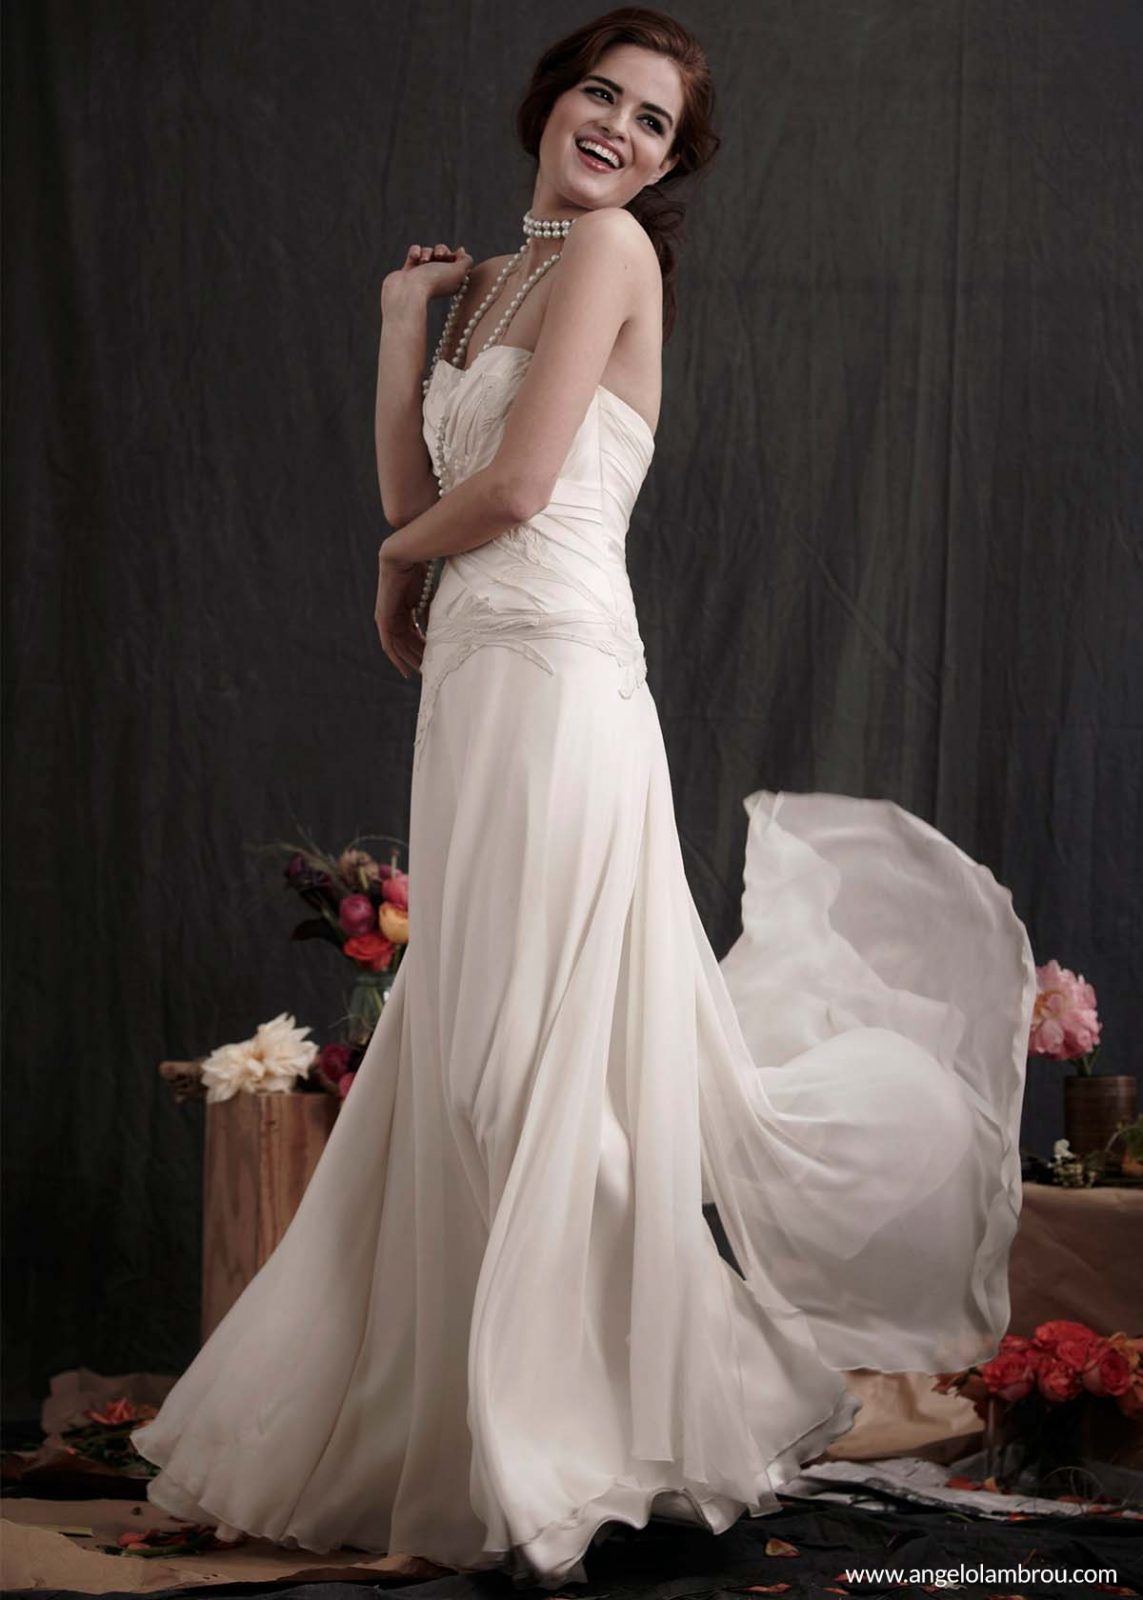 Wedding Dress Isadora By Angelo Lambrou